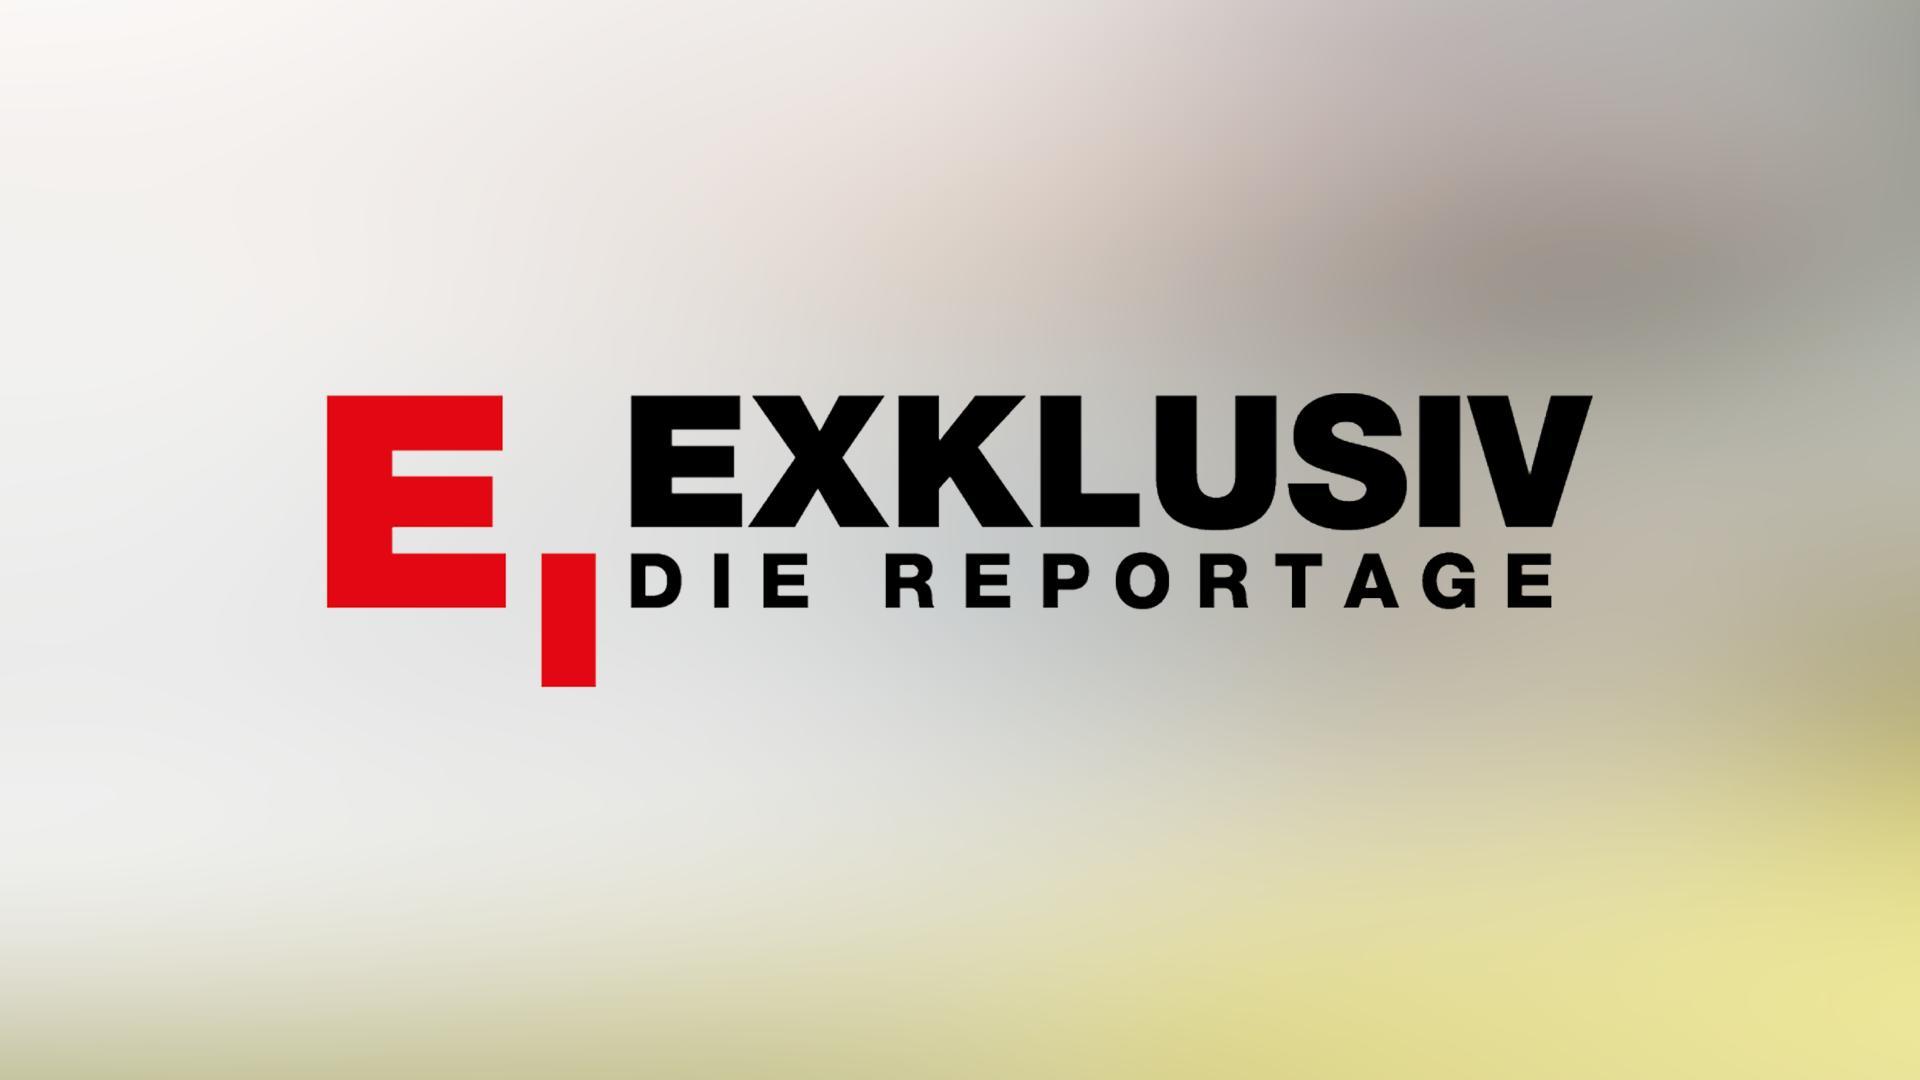 EXKLUSIV - DIE REPORTAGE